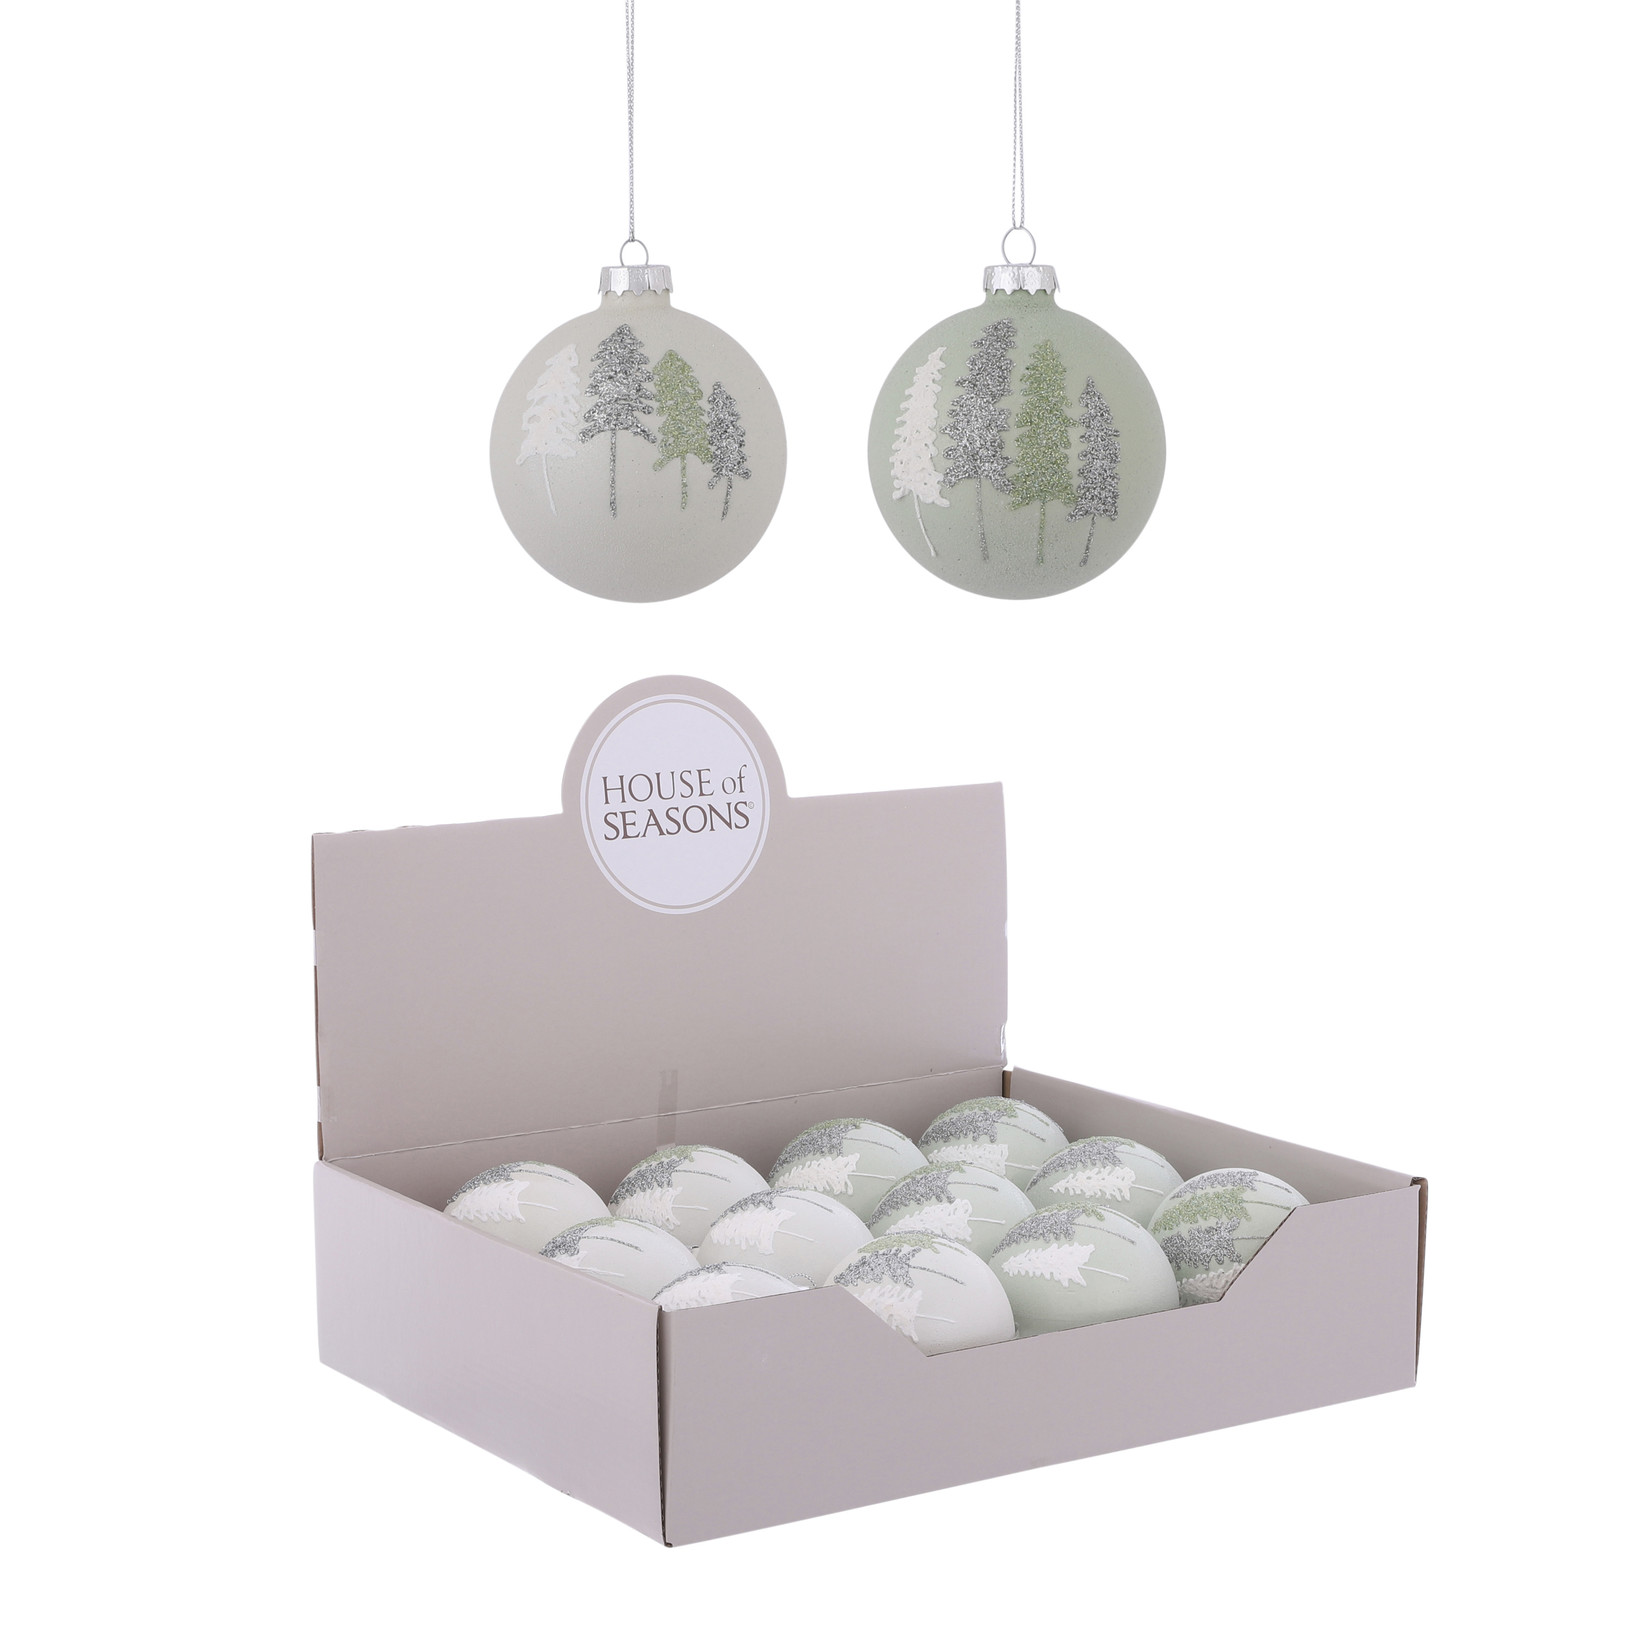 House of Seasons Ornament bal wit groen